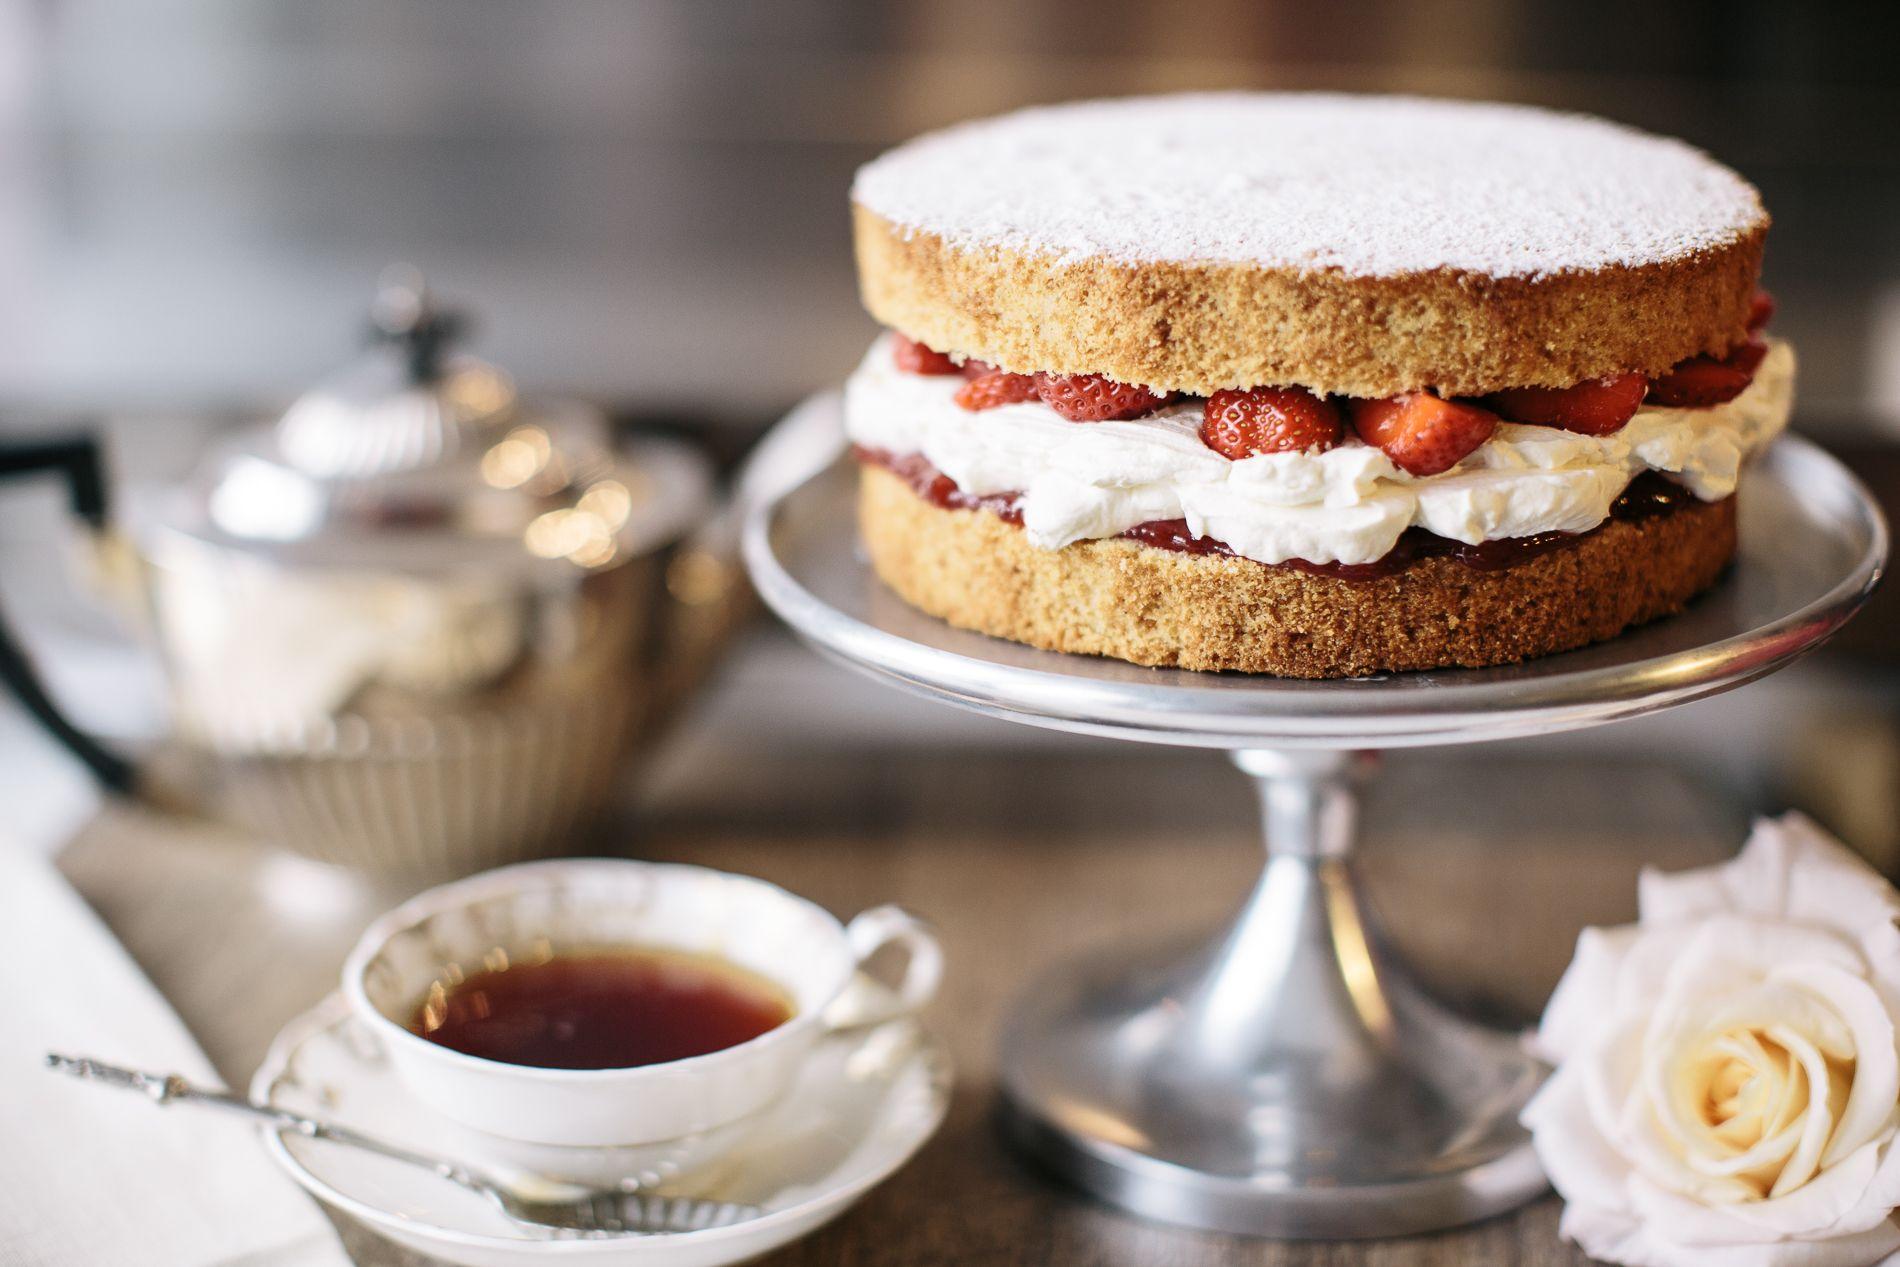 Victoria Sponge cake from Melissa tea room & cakes